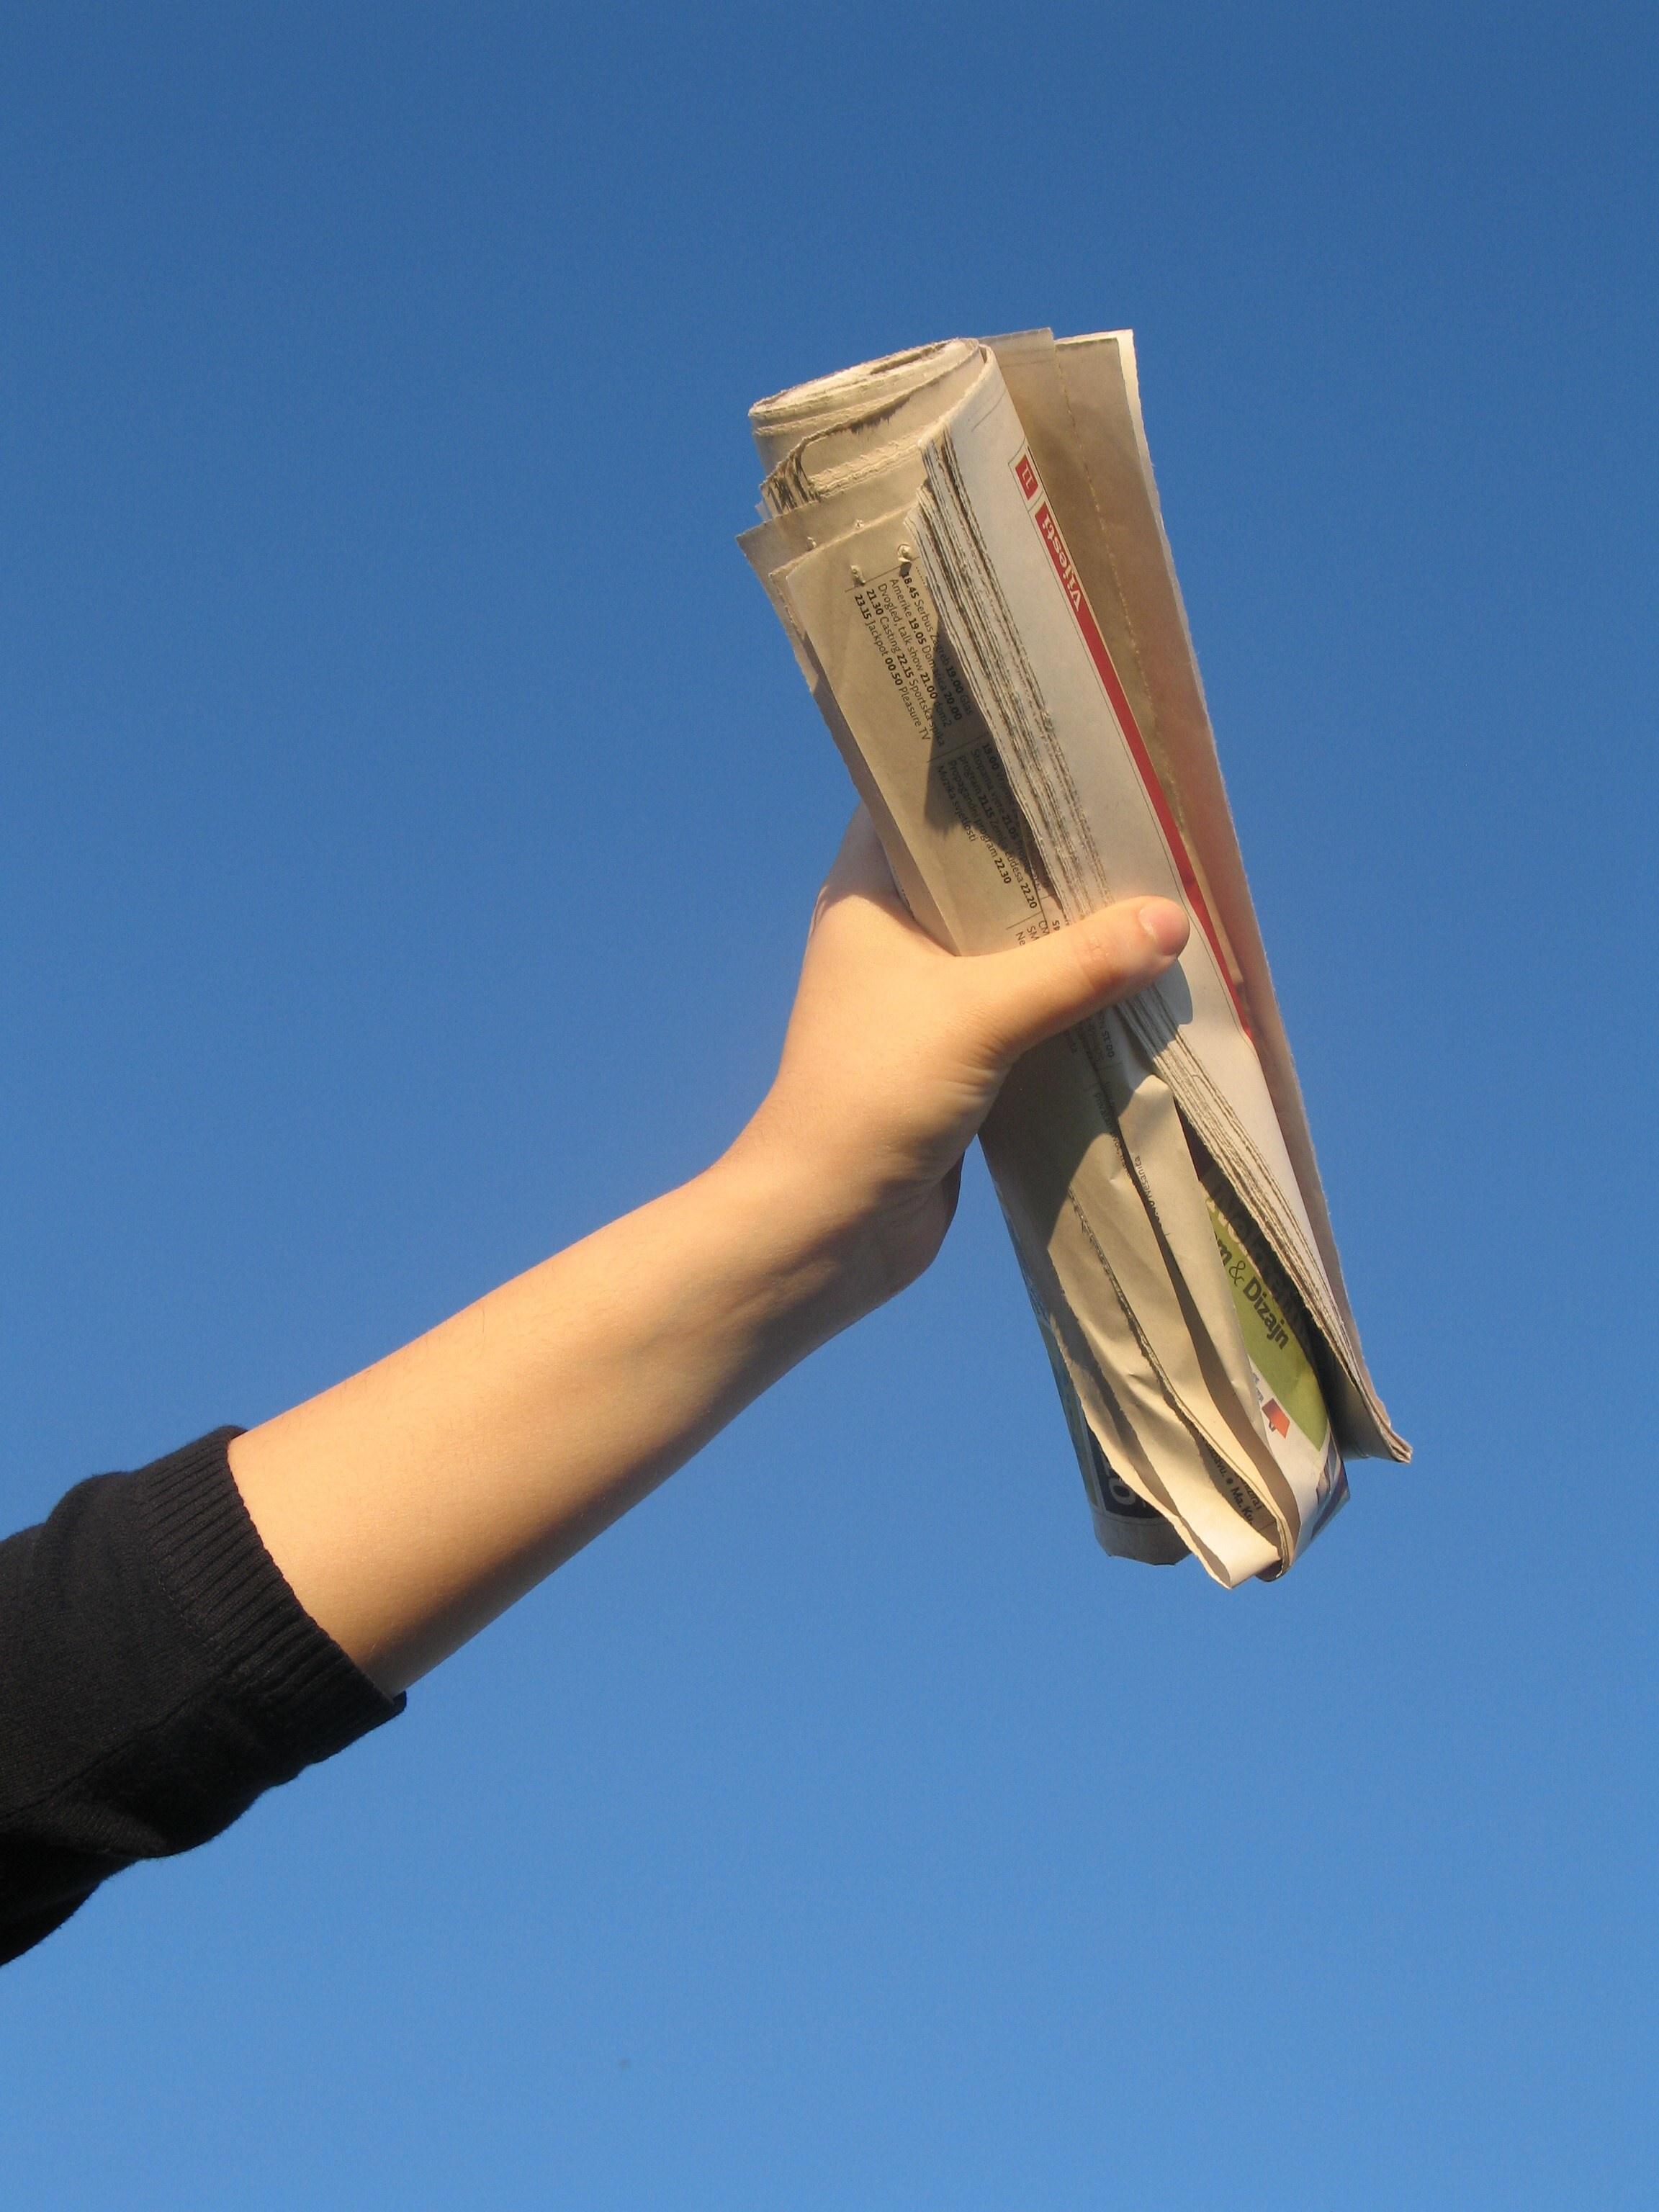 Newspaper editor definition